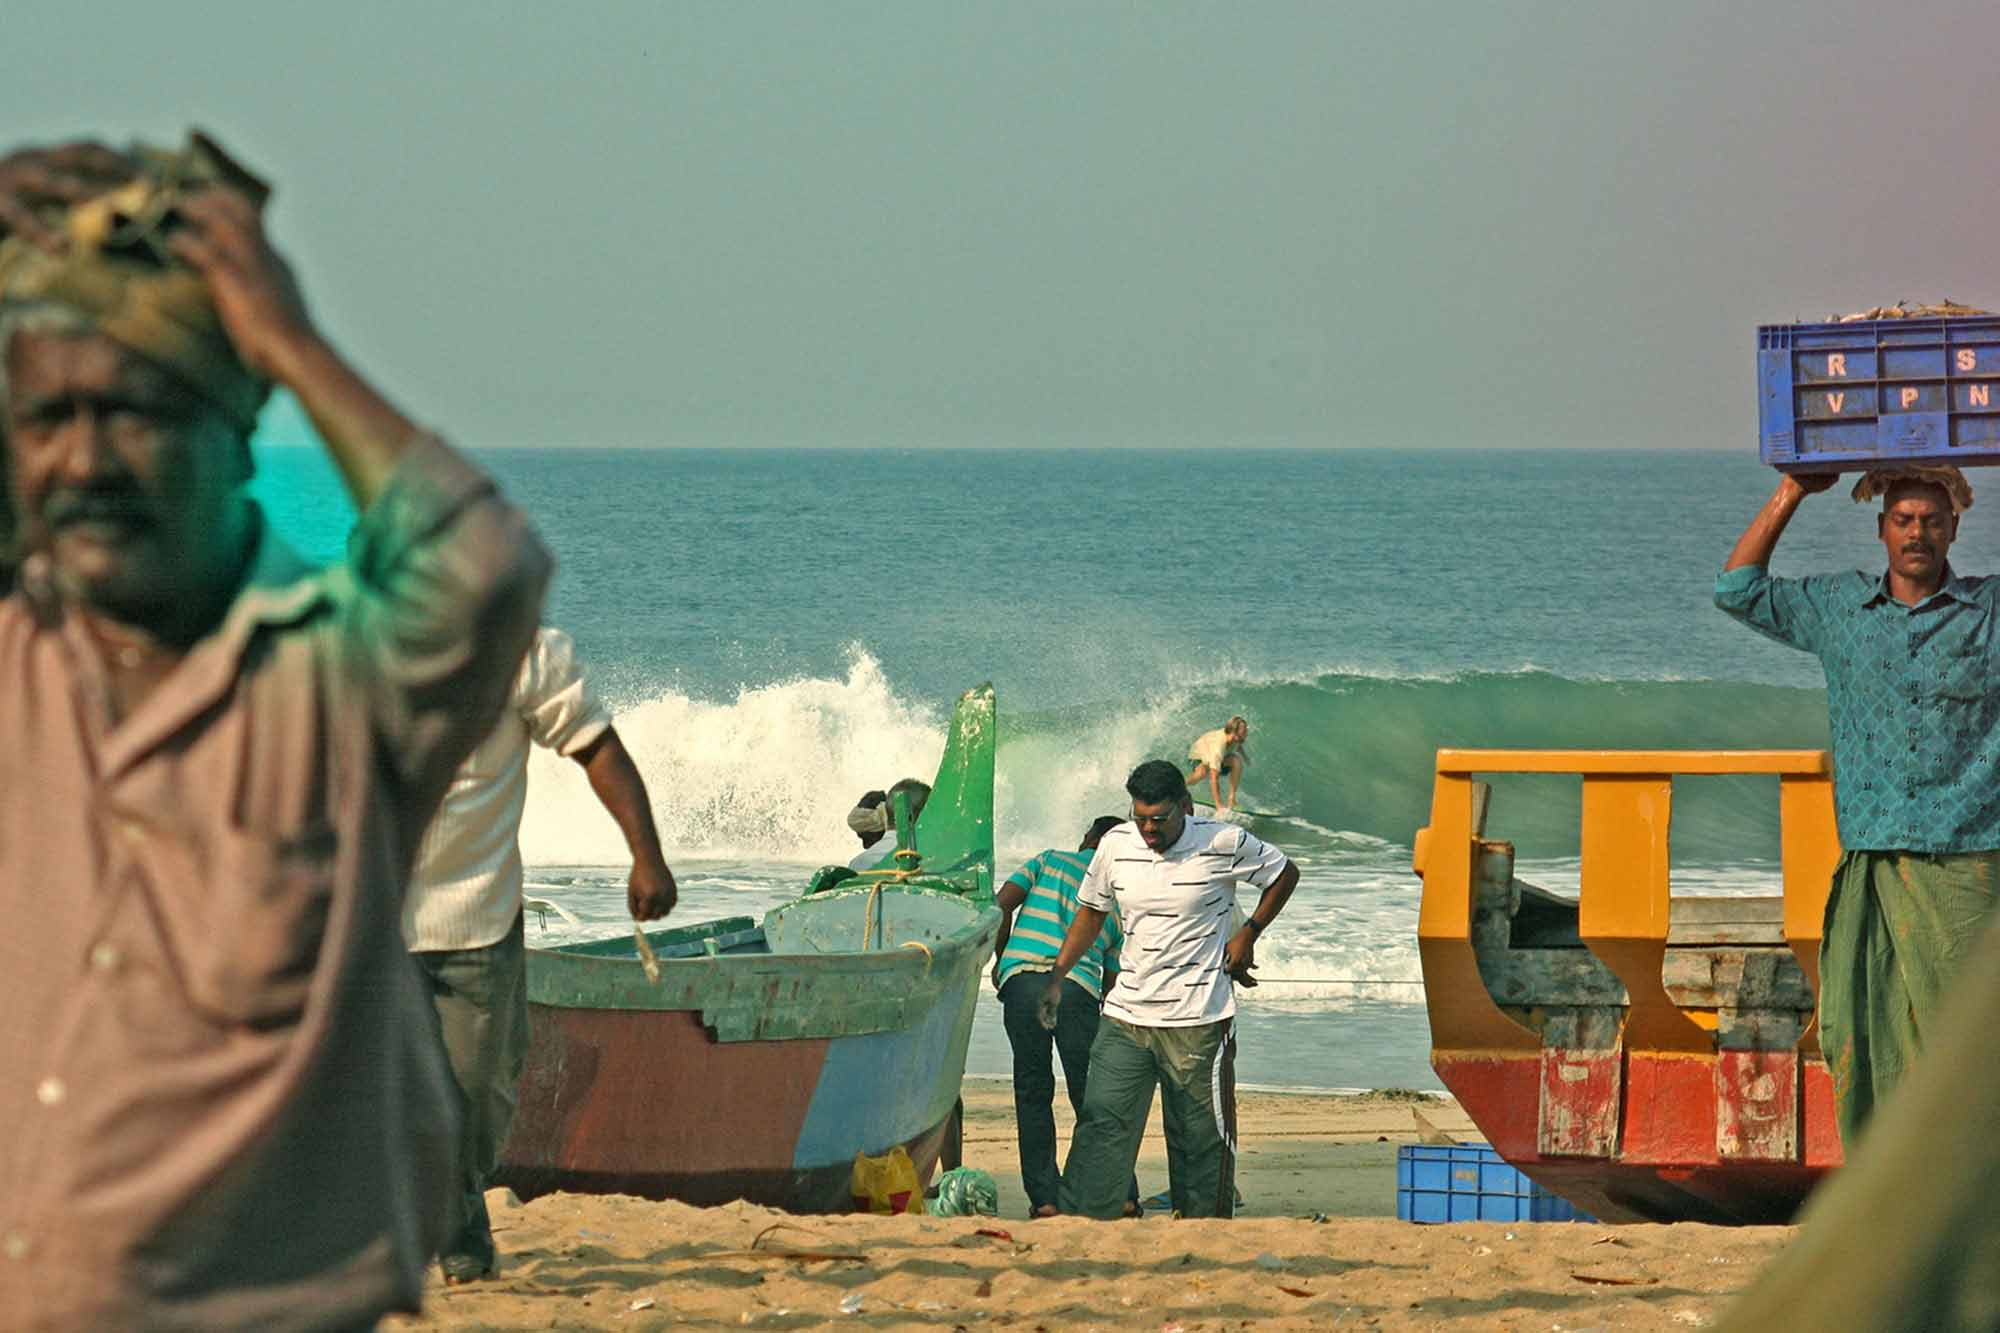 https://www.soulandsurf.com/wp-content/uploads/2021/09/Retreatsindia-images-SBS-Cover-shot-india.jpg